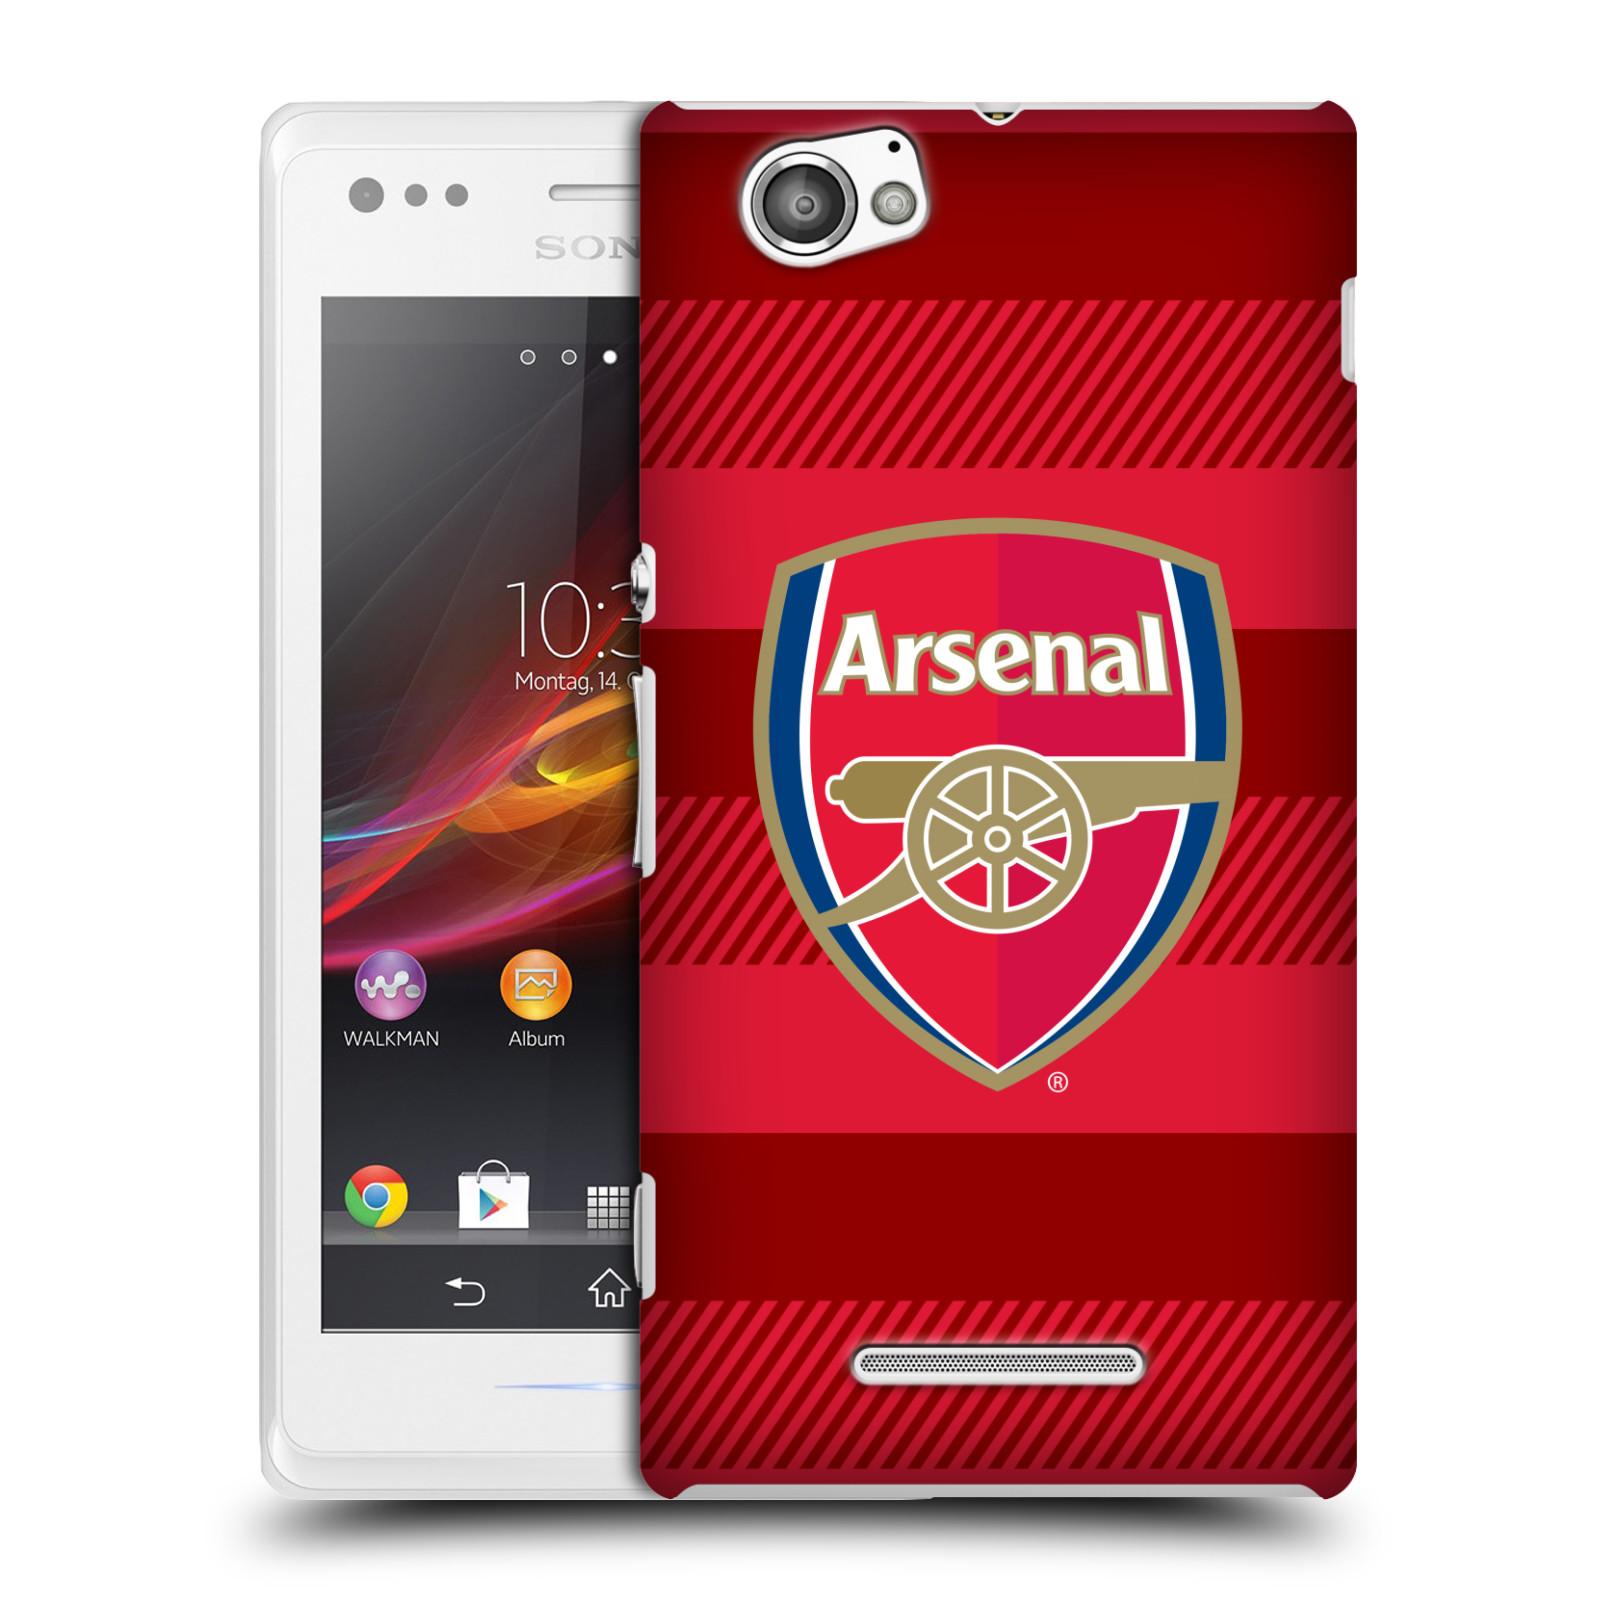 Plastové pouzdro na mobil Sony Xperia M C1905 - Head Case - Arsenal FC - Logo s pruhy